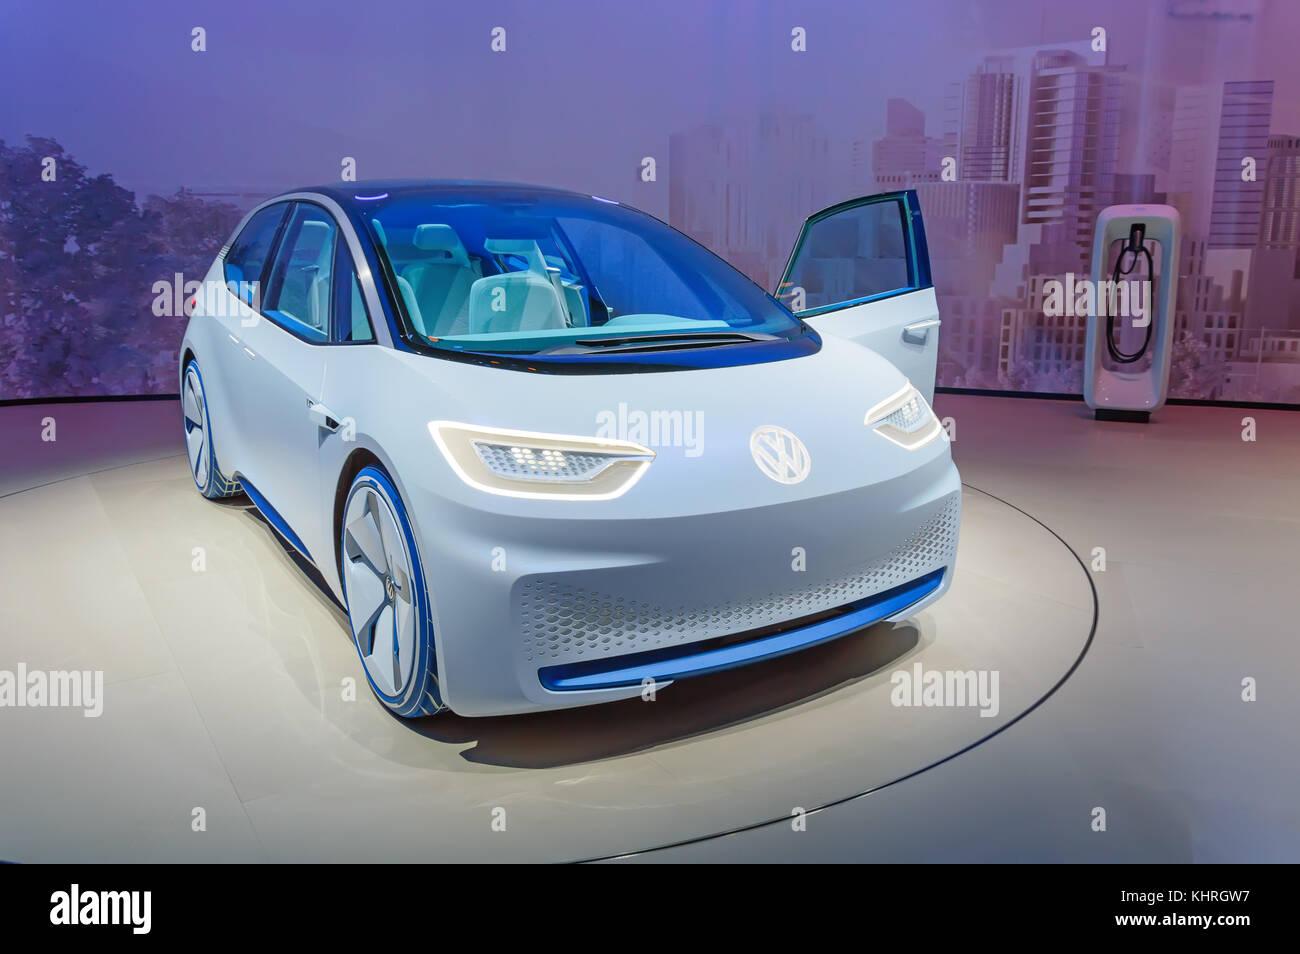 FRANKFURT, GERMANY - SEP 17, 2017: Volkswagen I.D. autonomous electric car at IAA Frankfurt Motor Show. VW ID is - Stock Image